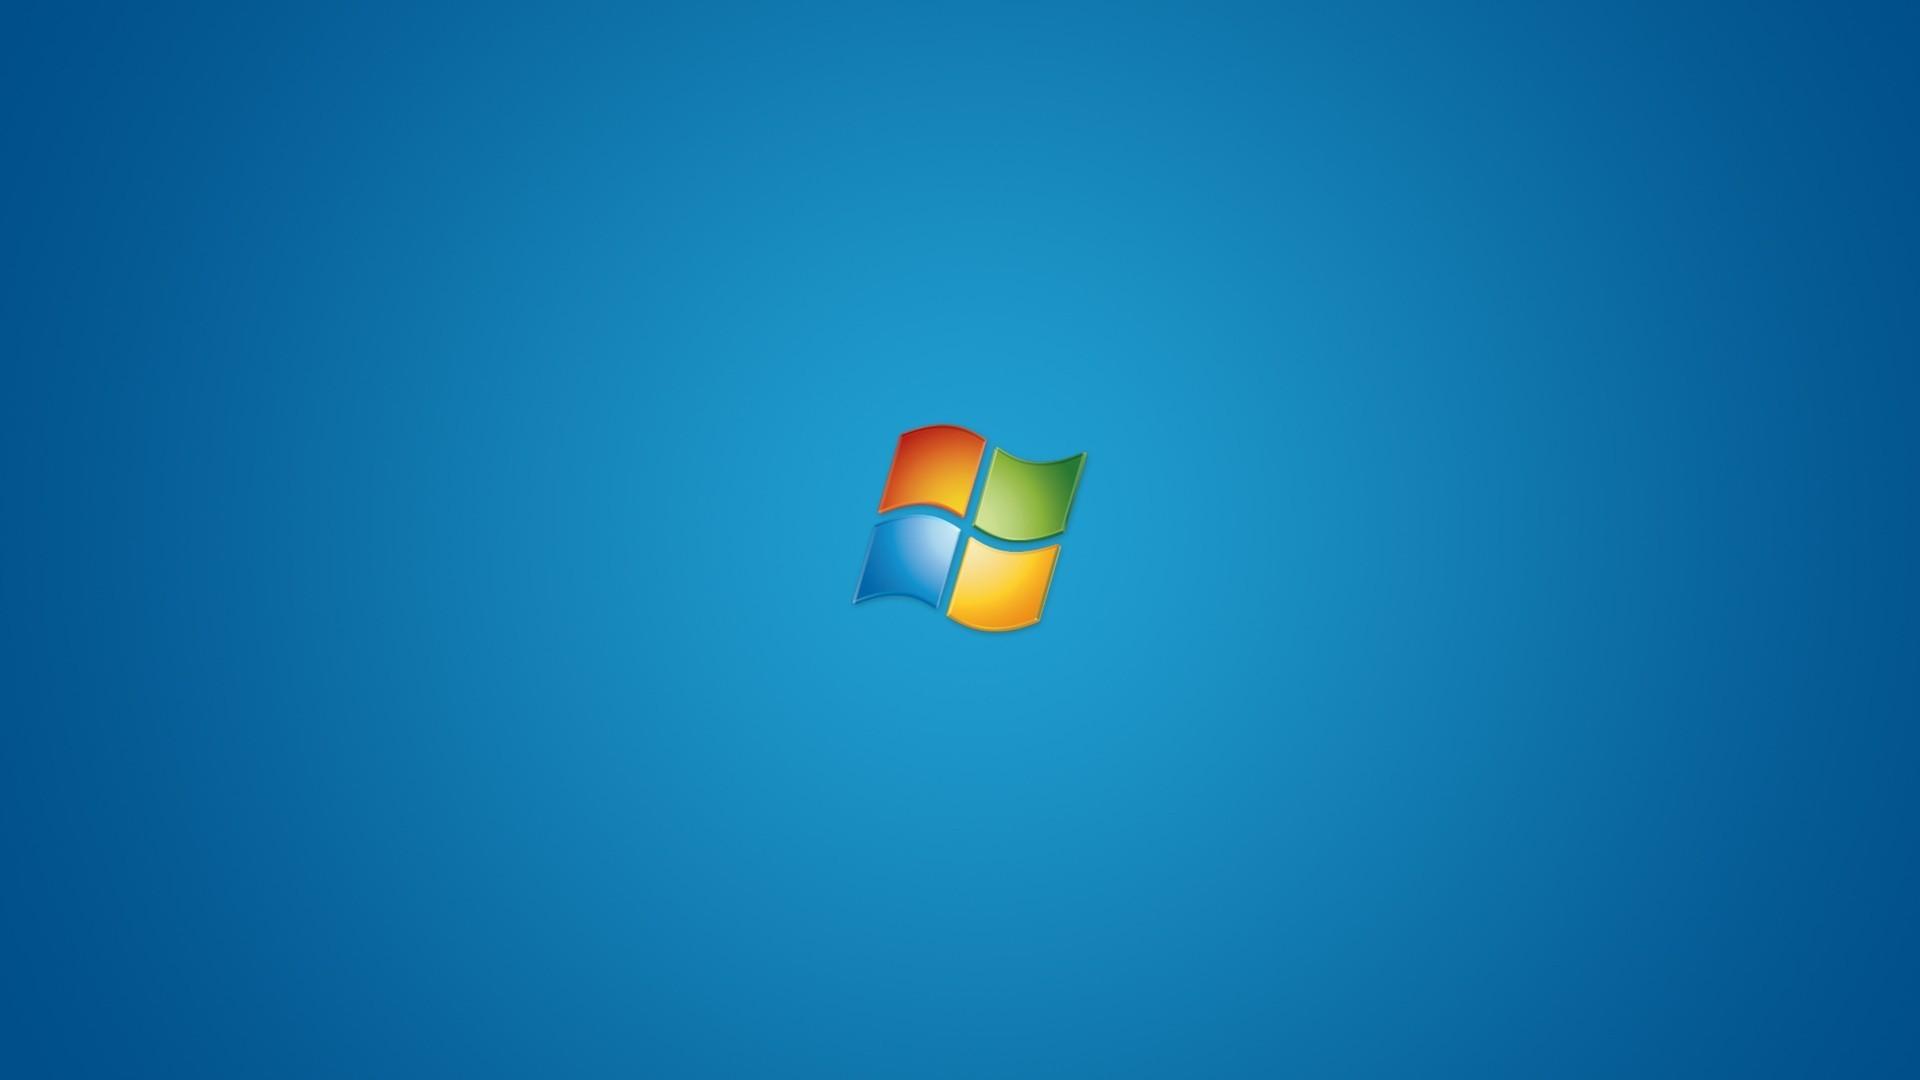 Res: 1920x1080, Window Wallpapers 22 - 1920 X 1080